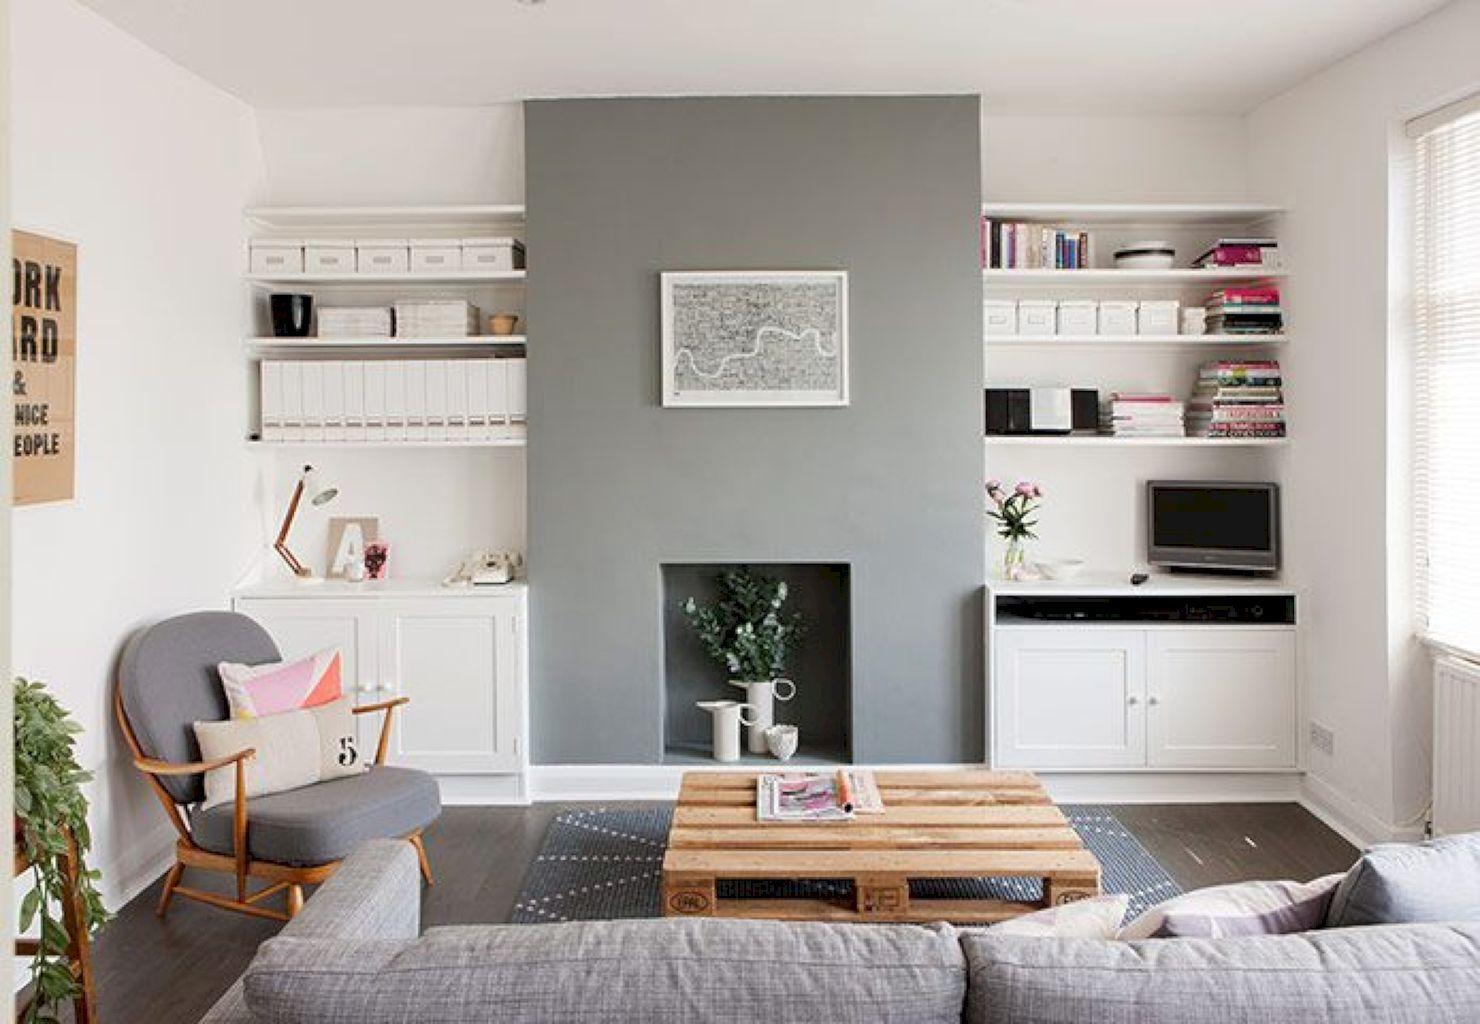 comfy living room design and decor ideas also rh pinterest